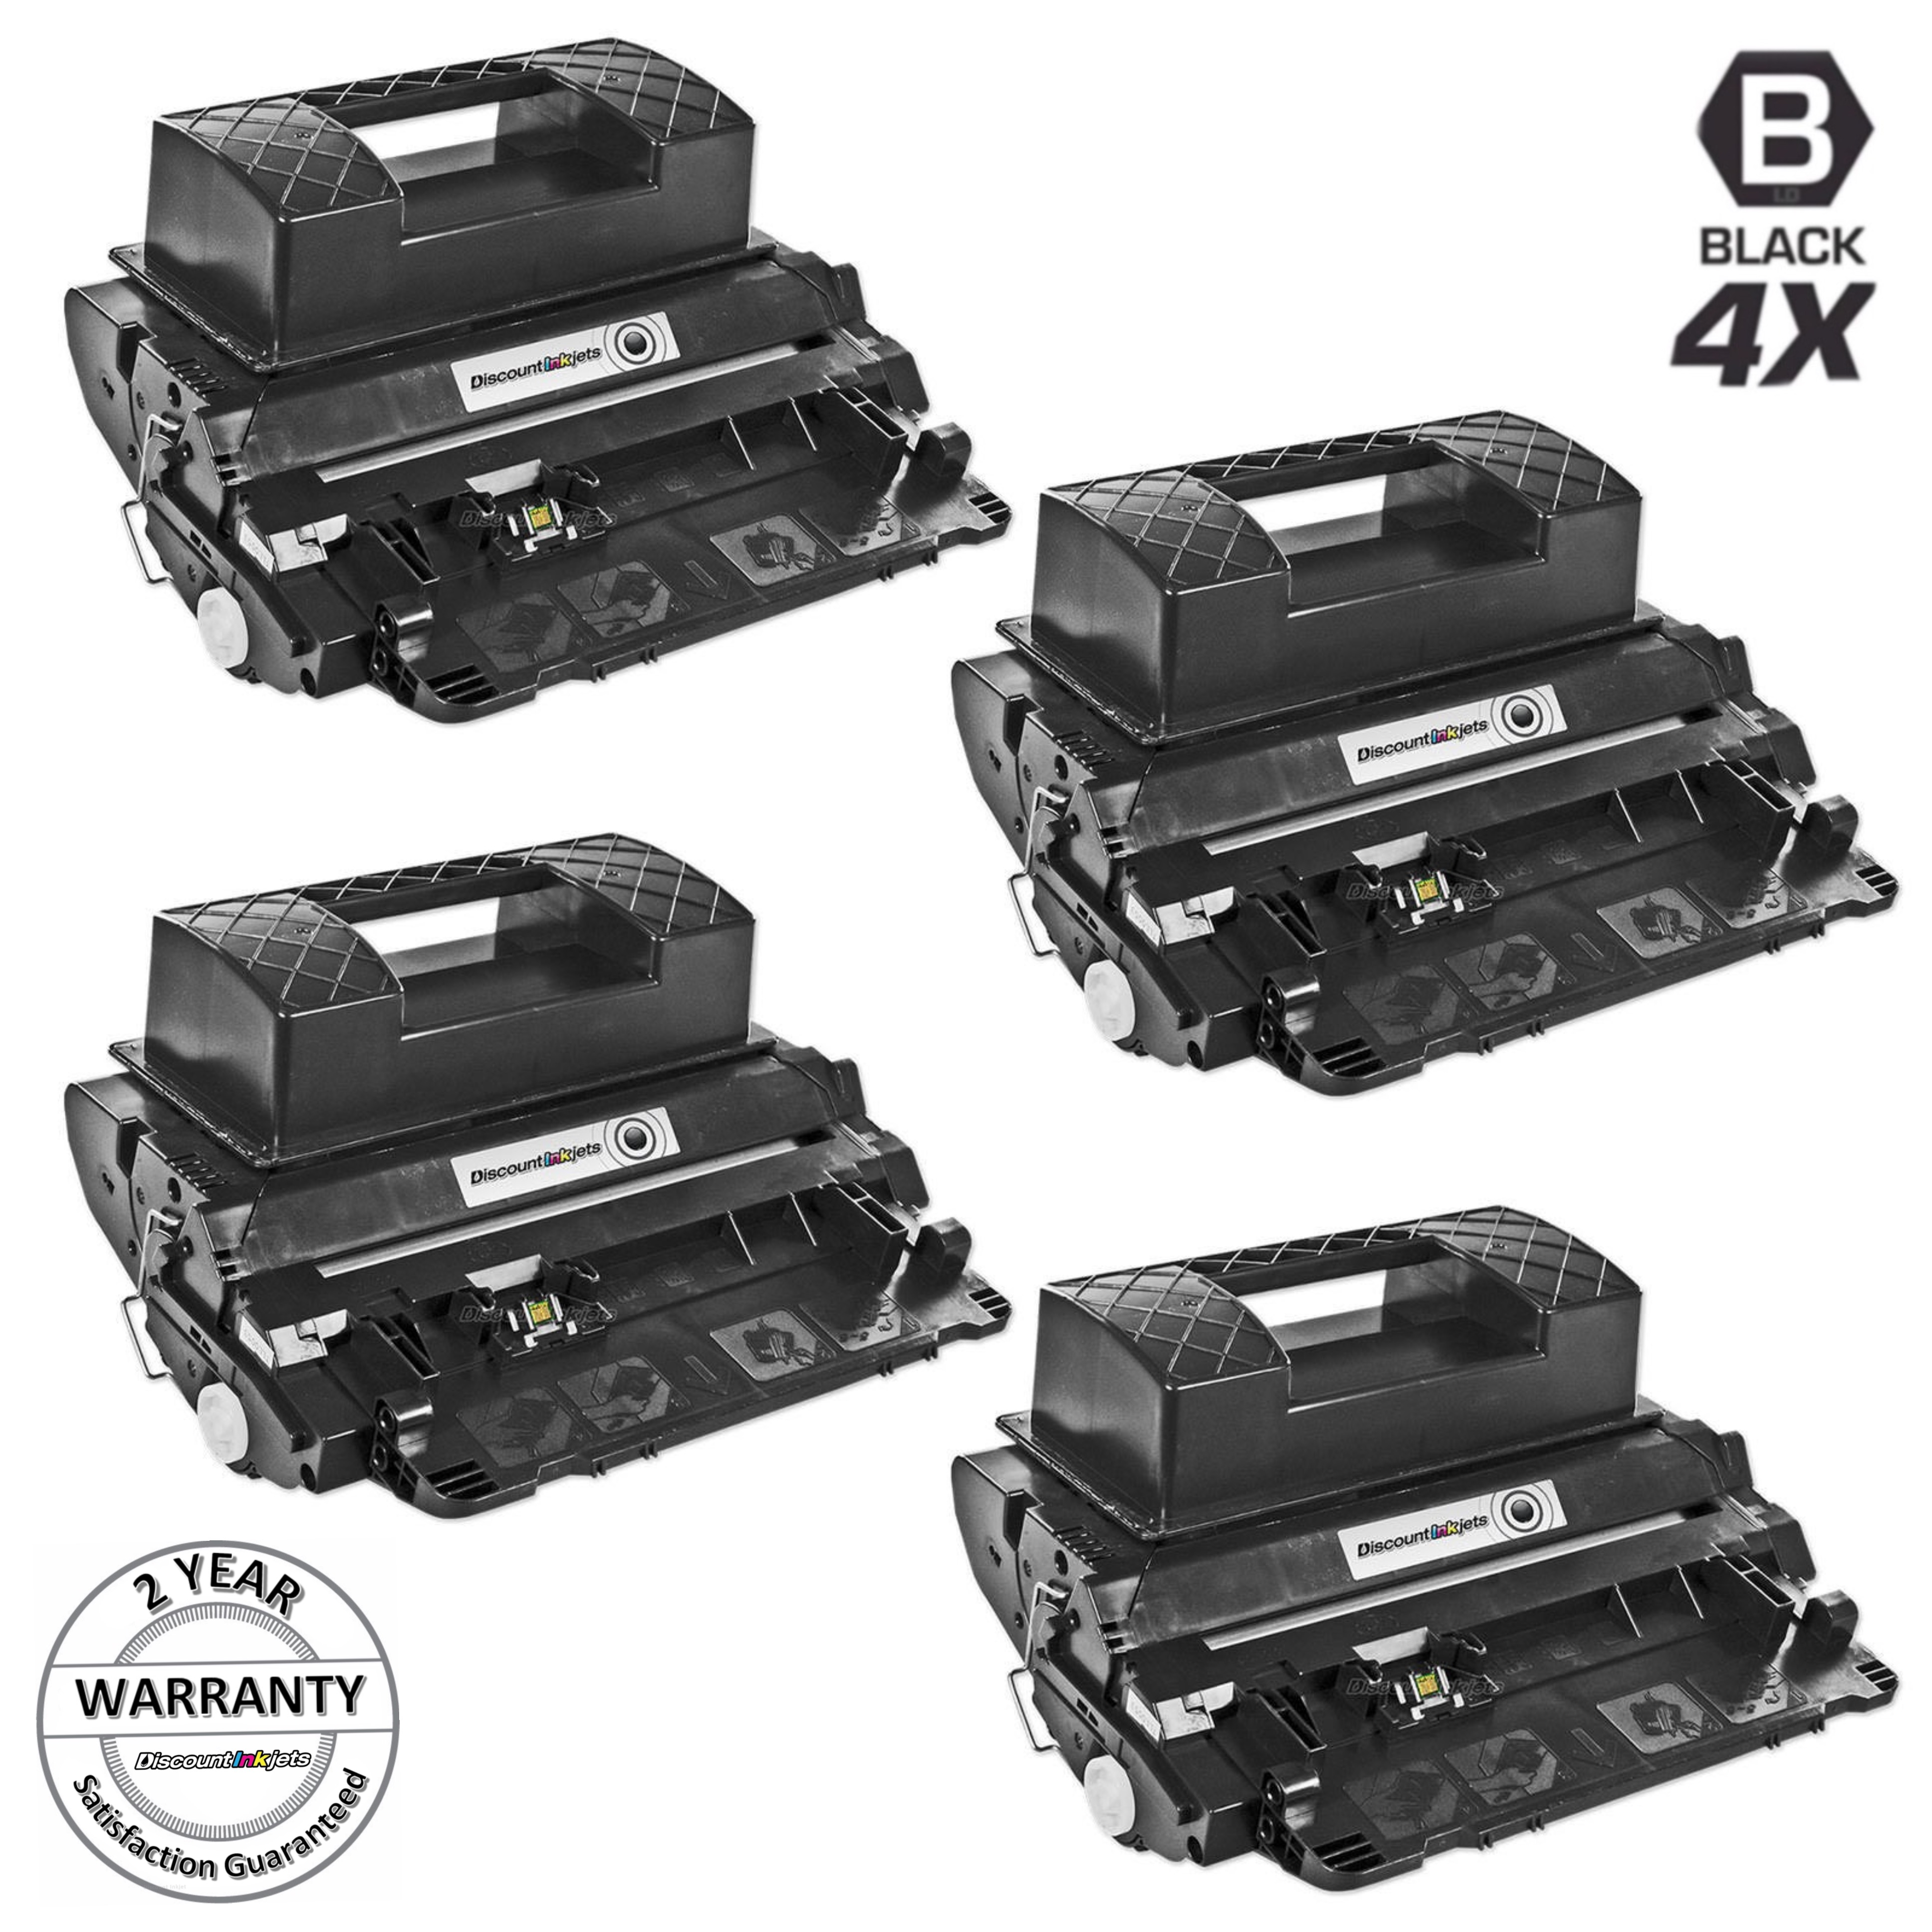 4 pack CC364X Toner Cartridge fits HP P4015dn P4515tn P4515n P4515x Printer